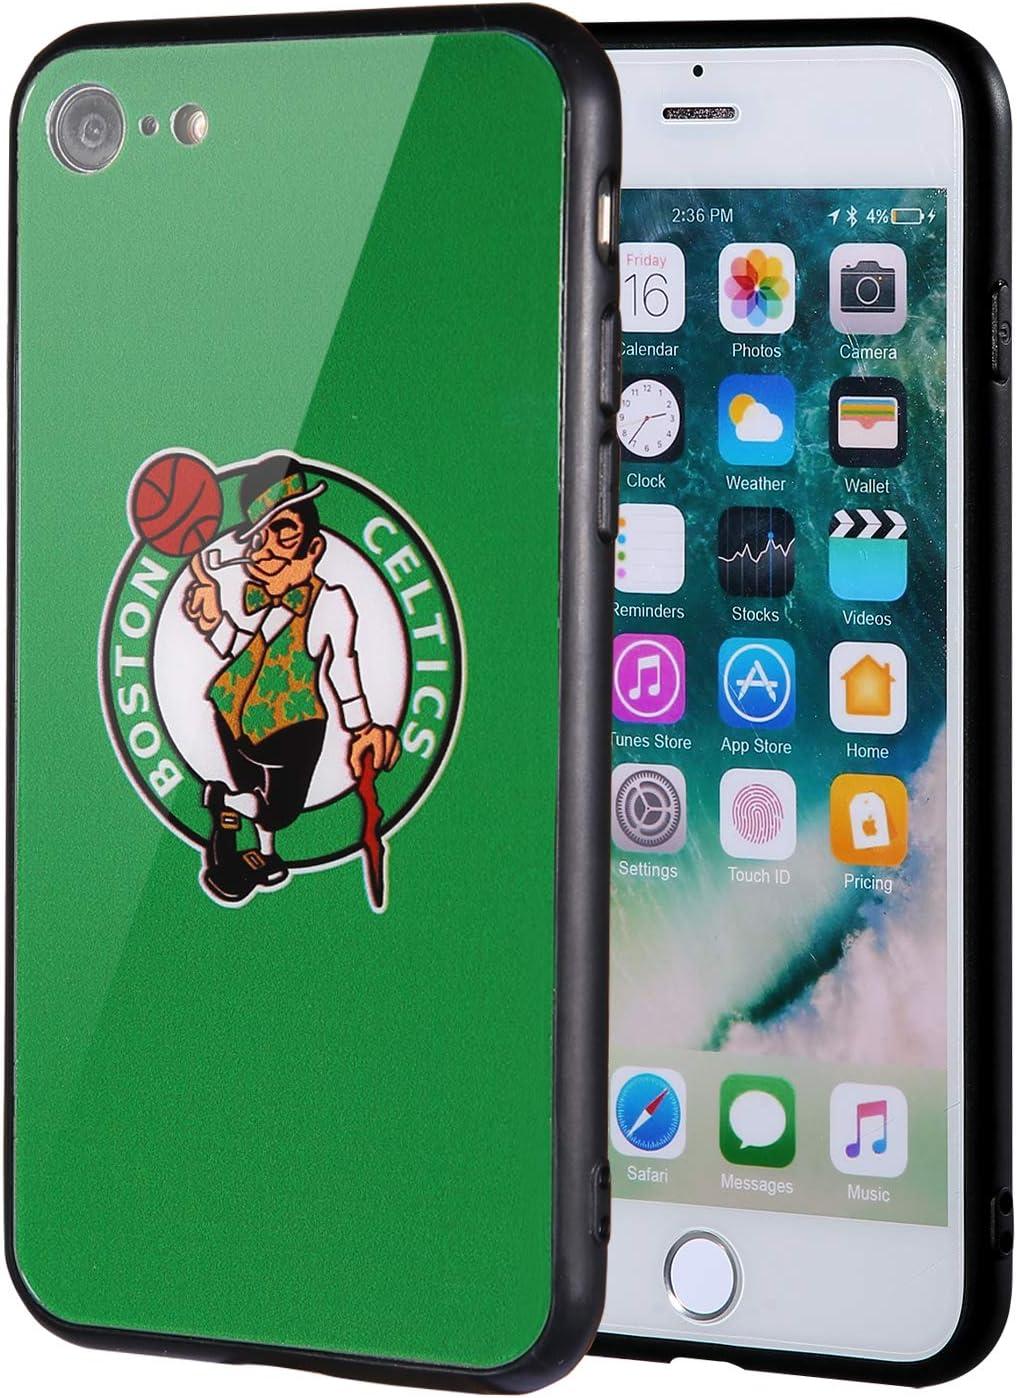 Boston Celtics 1 iphone case